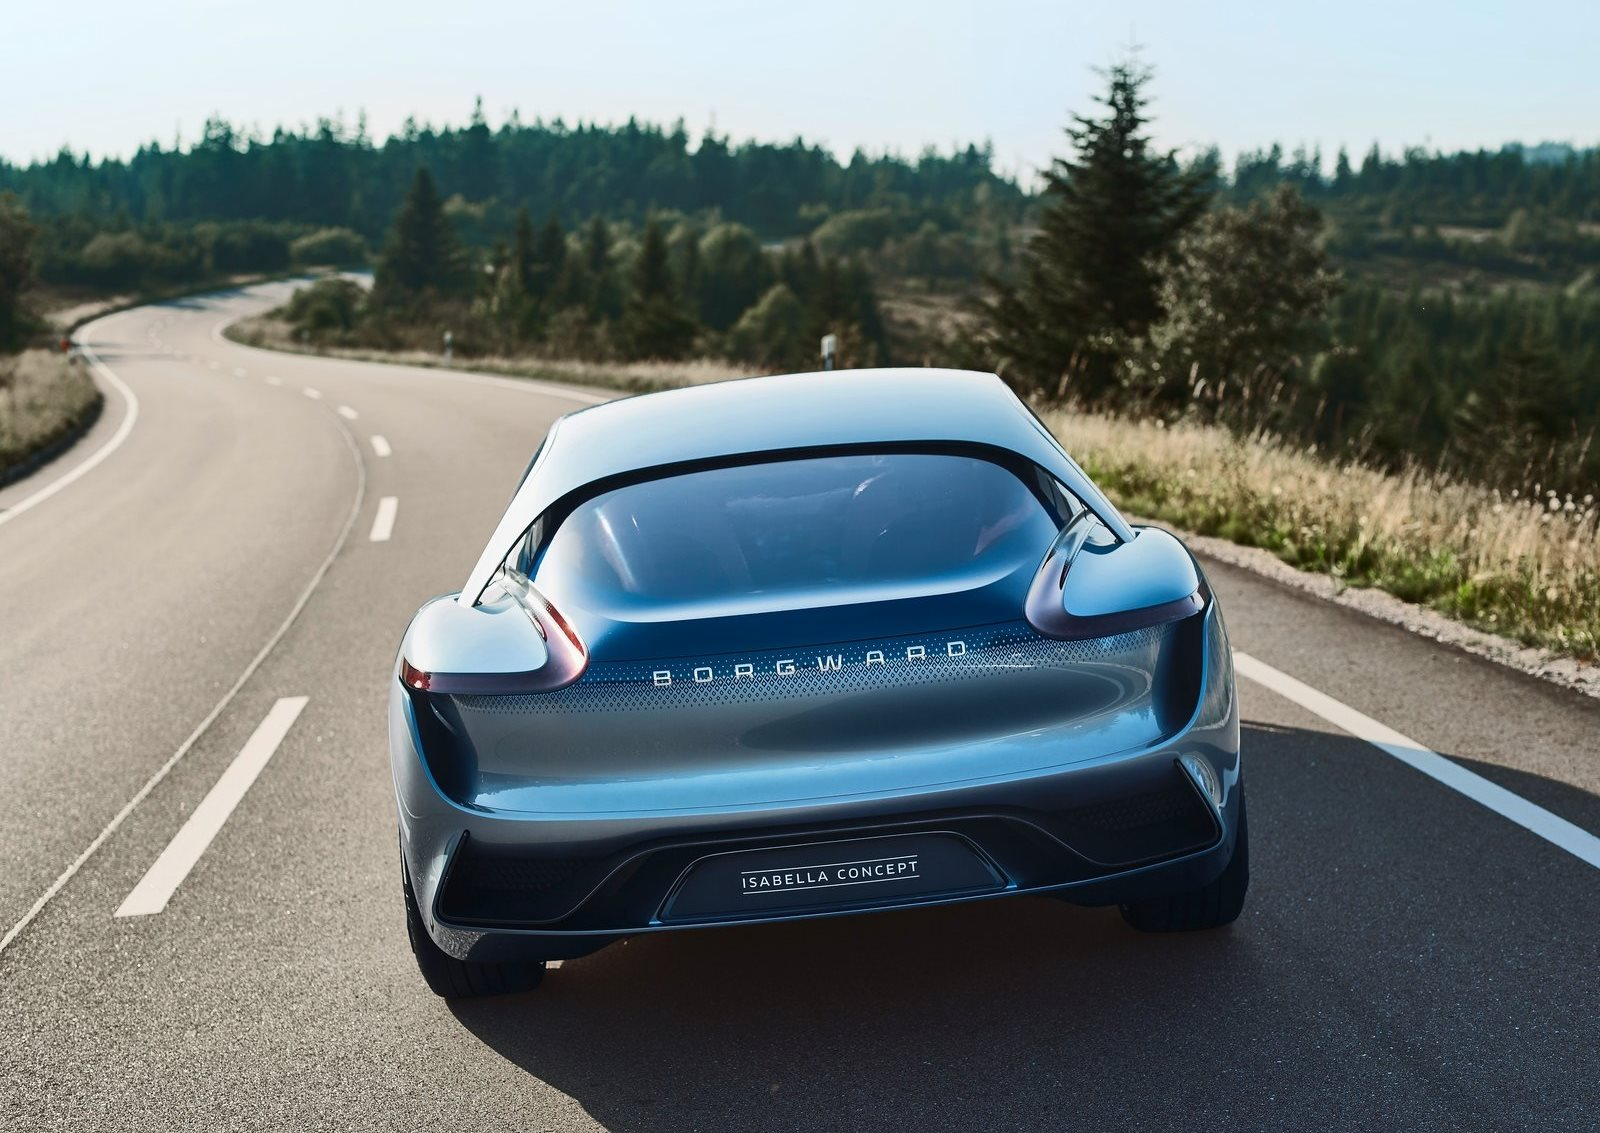 Borgward-Isabella_Concept-2017-1600-0b